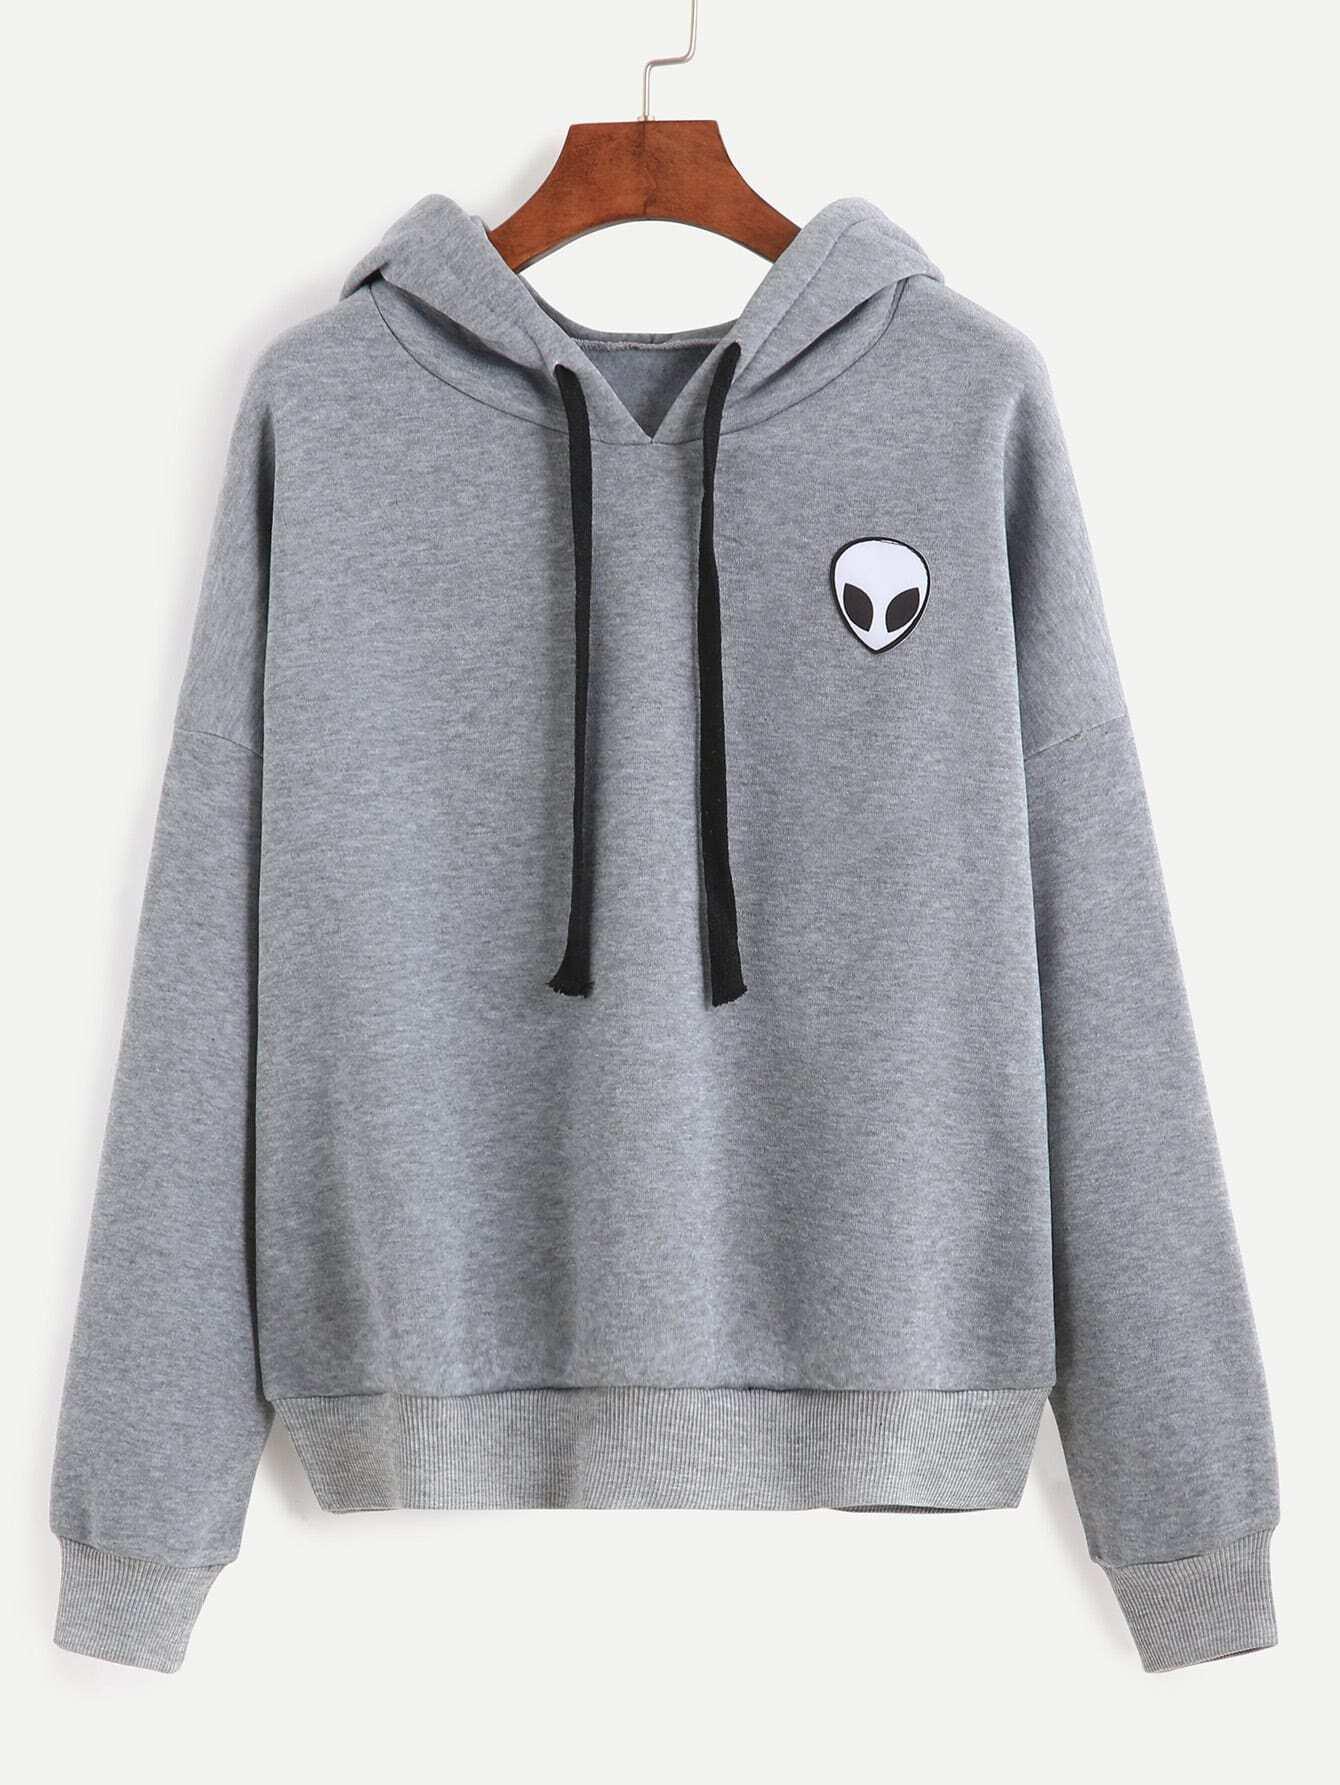 Grey Alien Print Hooded Sweatshirt